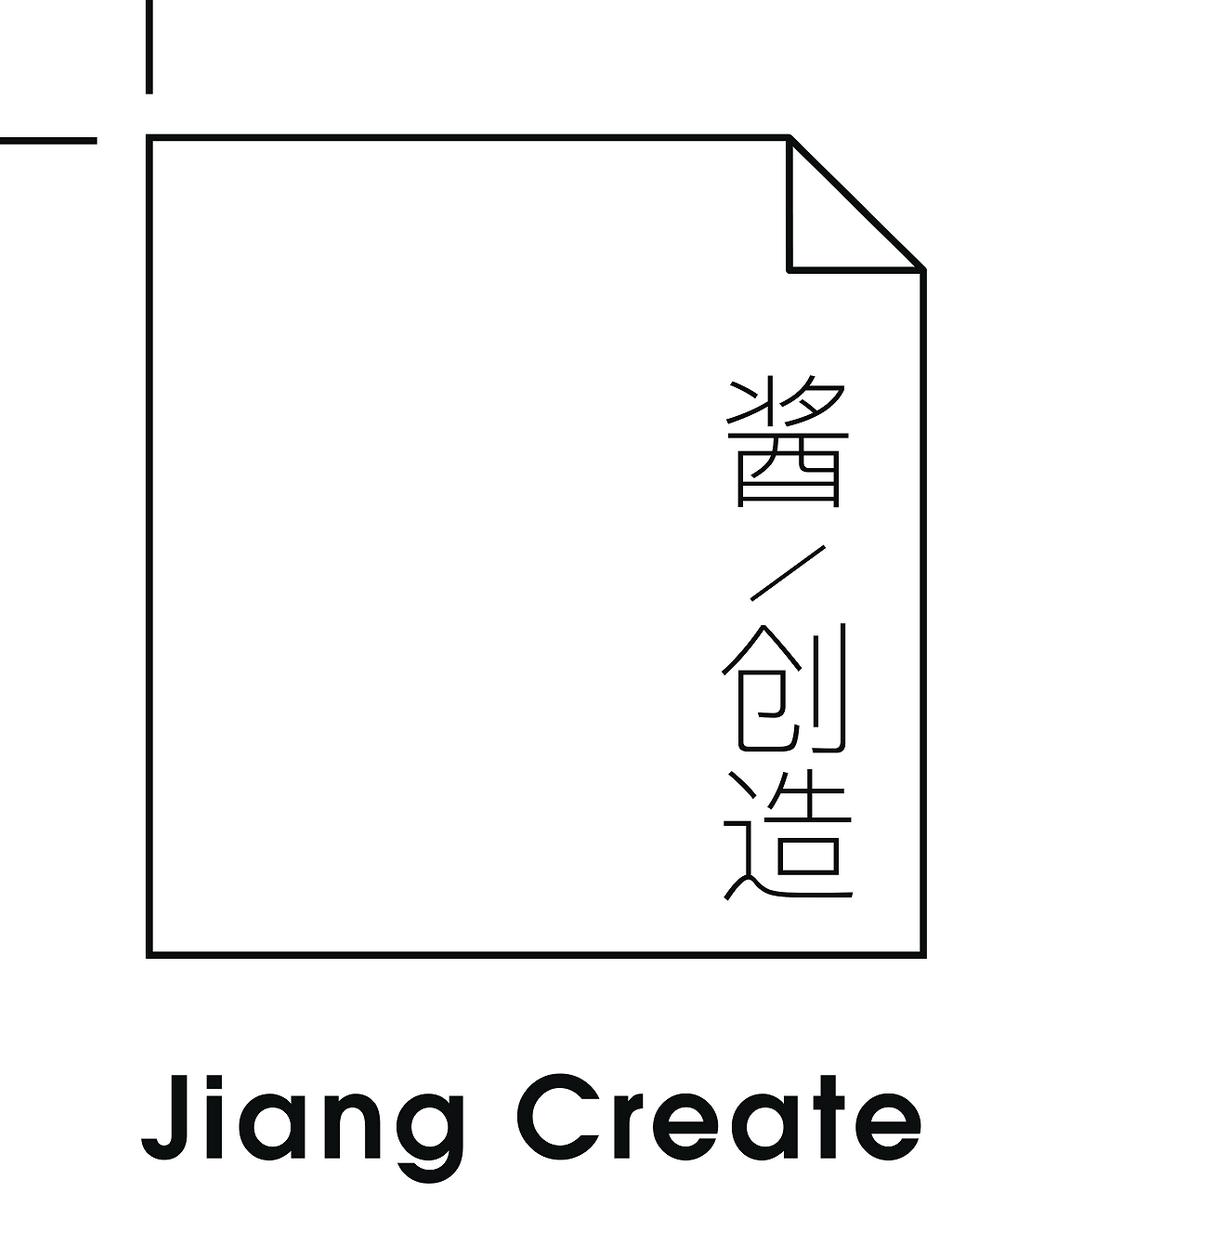 Jiang Create